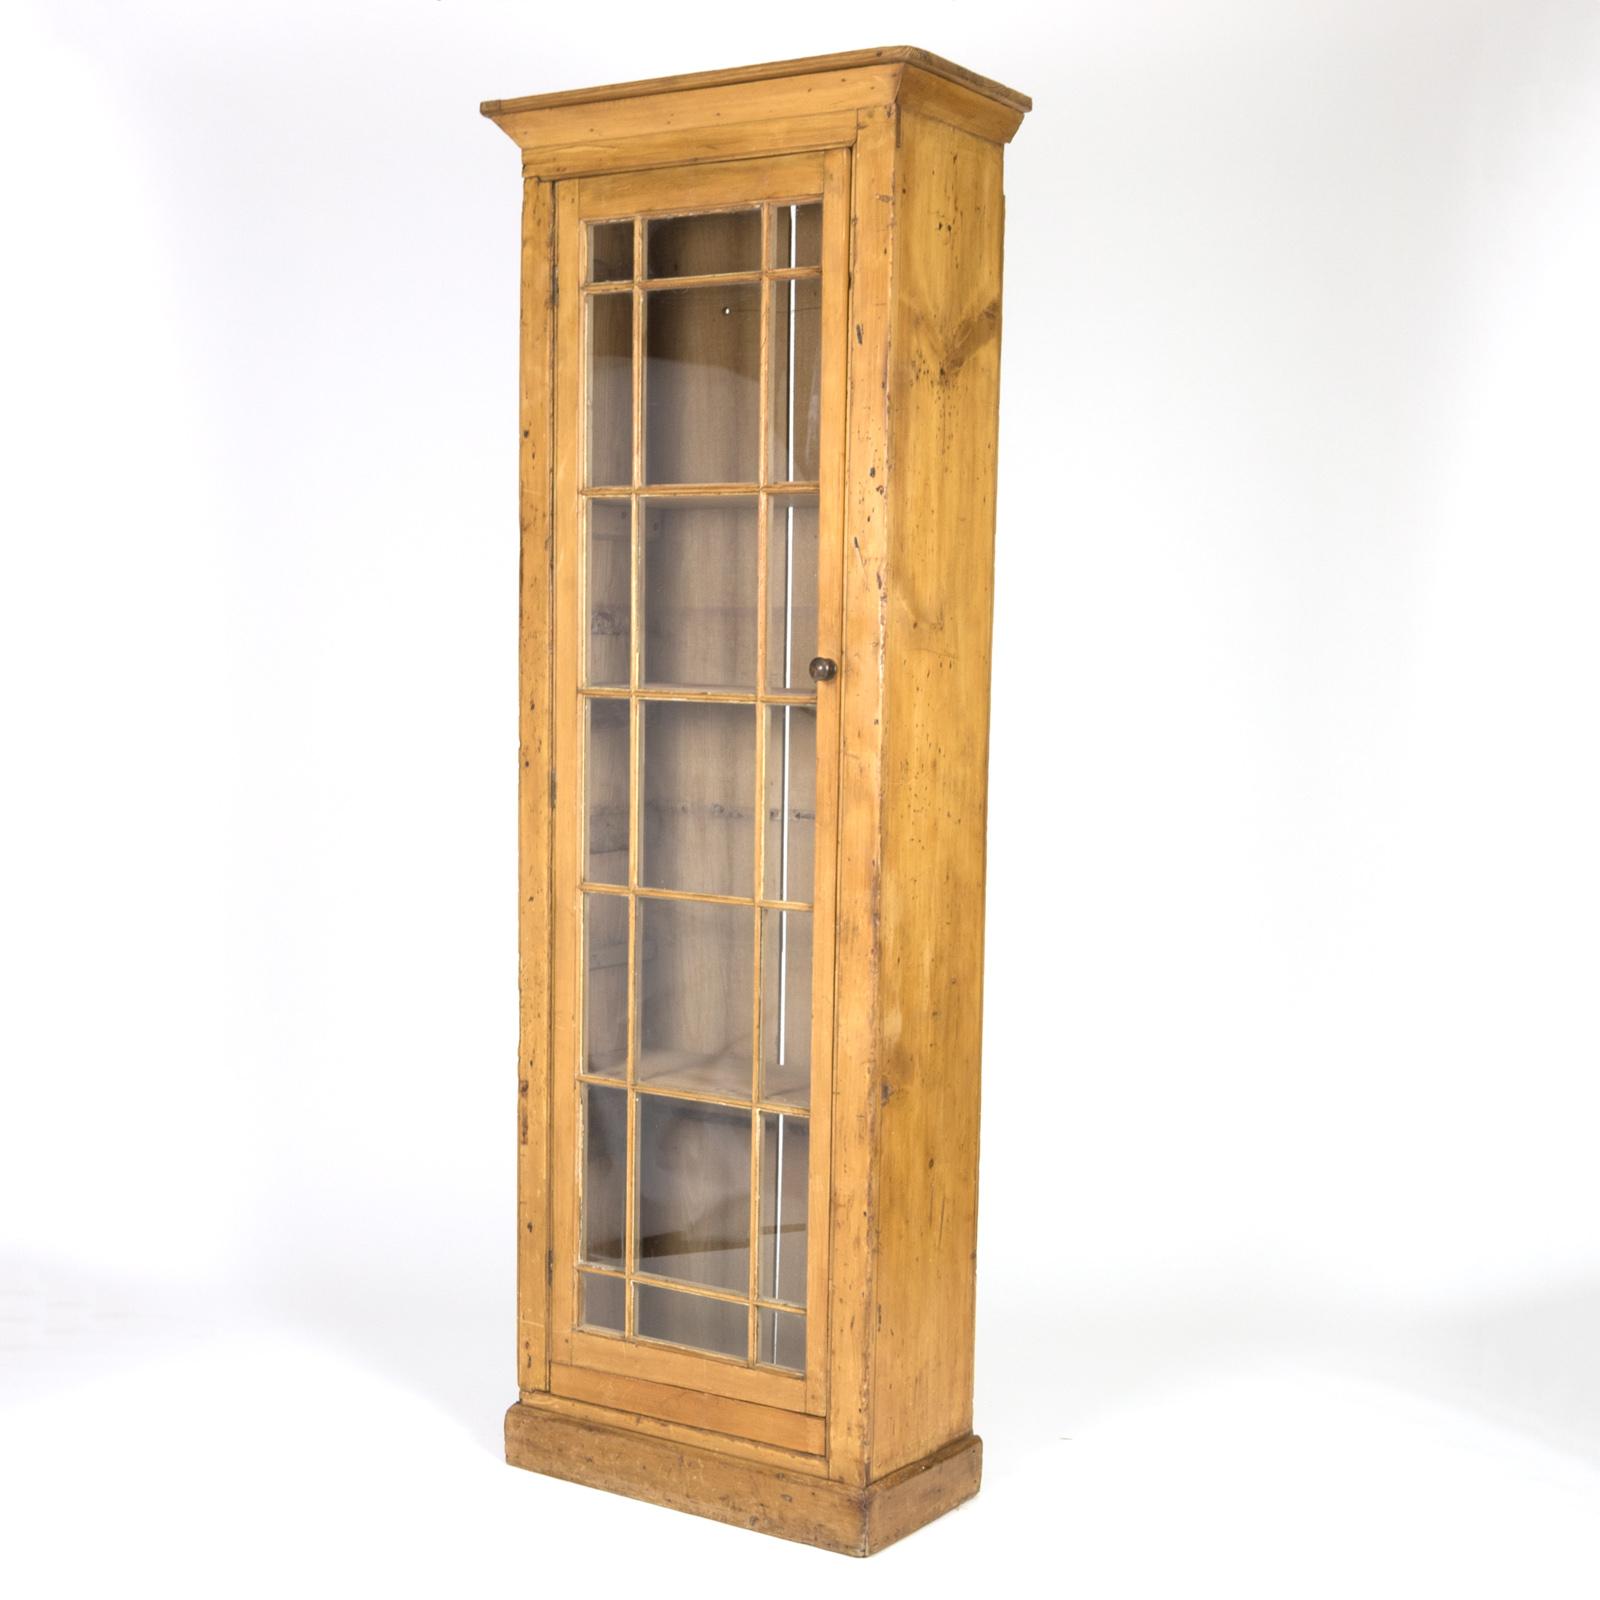 Vintage Narrow Pine Display Cabinet, 20th Century, Irish. 20 20 20